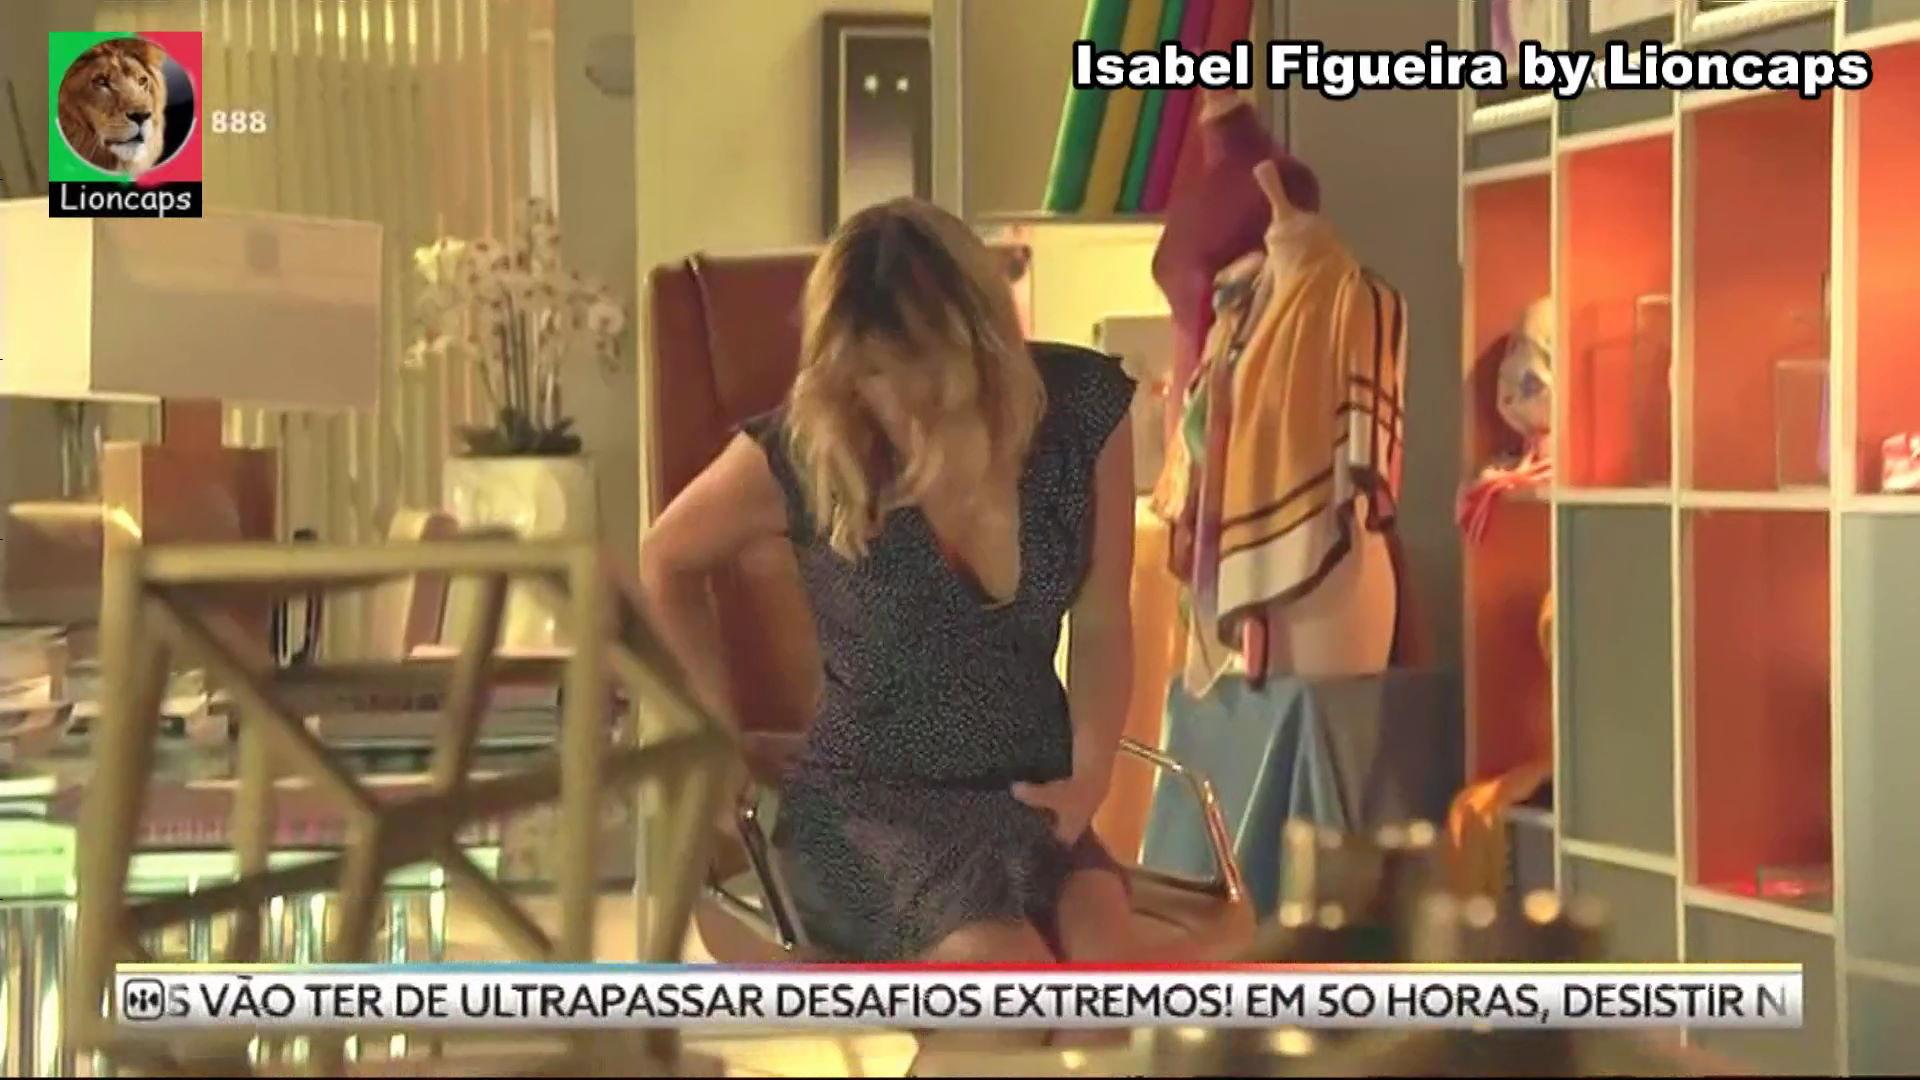 033846837_isabel_figueira_vs190612_1295_122_257lo.JPG